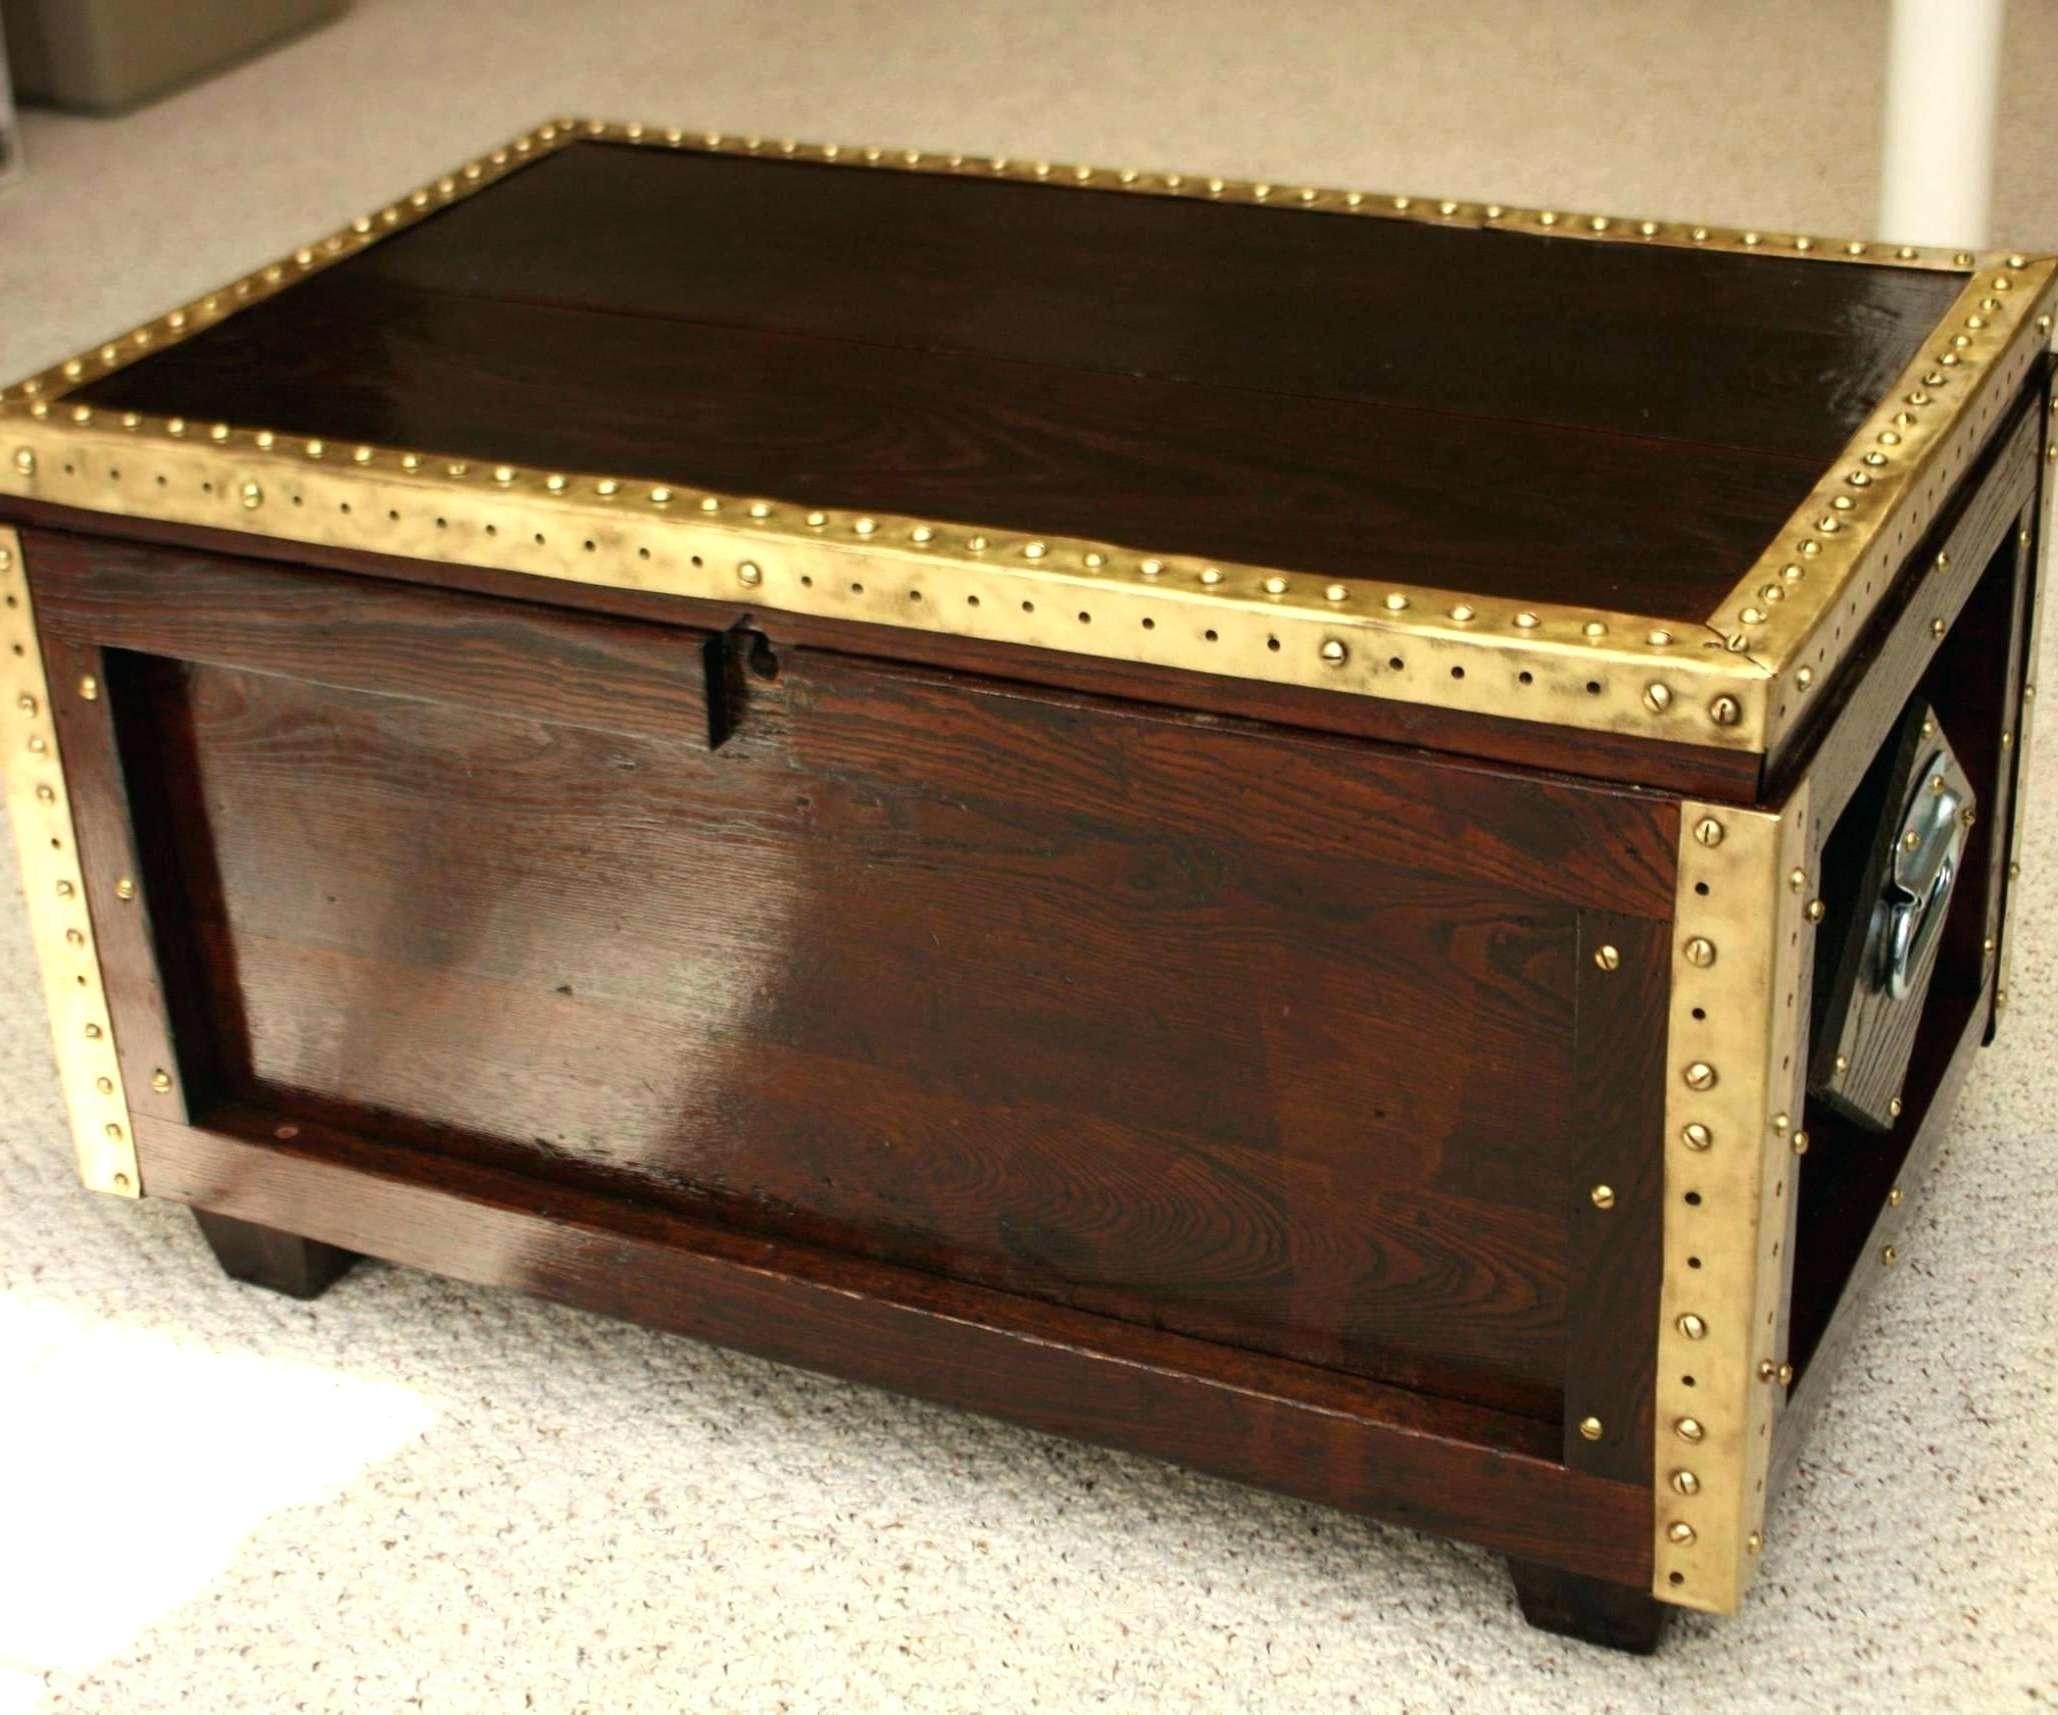 Newest Cd Storage Coffee Tables Regarding Stylish Cd Storage Coffee Table – Mediasupload (View 14 of 20)